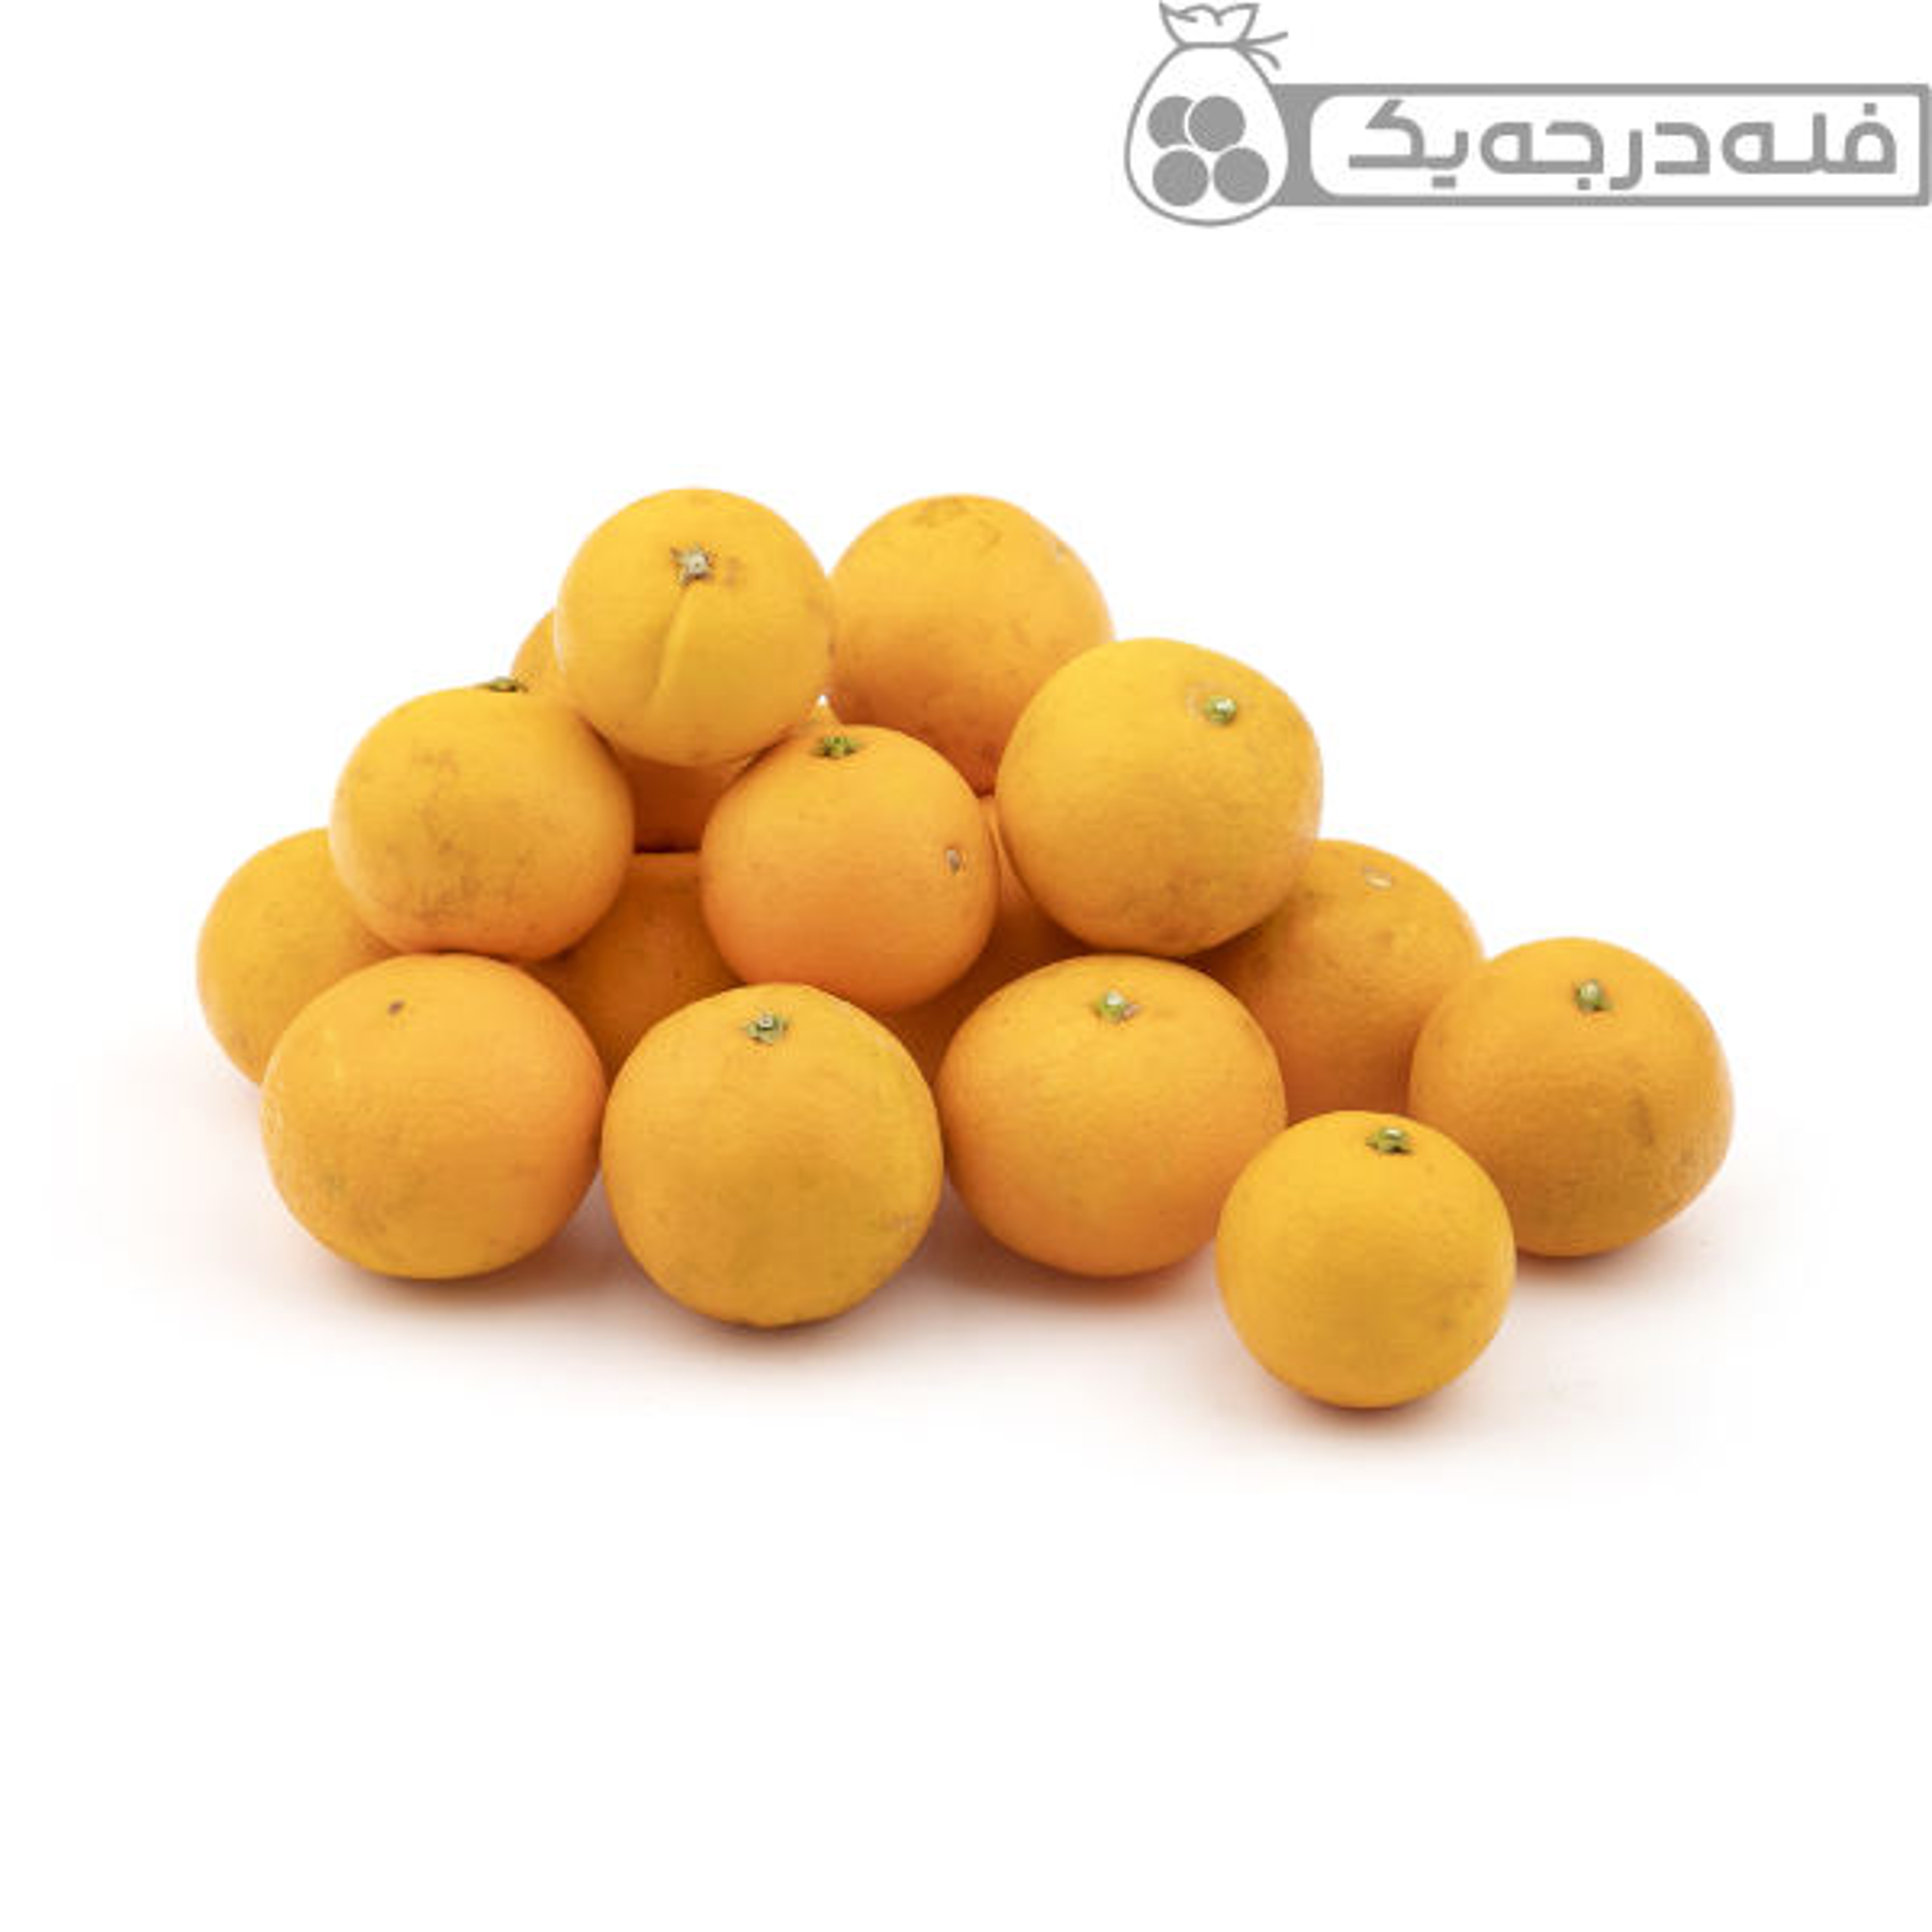 پرتقال آبگیری فله - 2.5 کیلوگرم